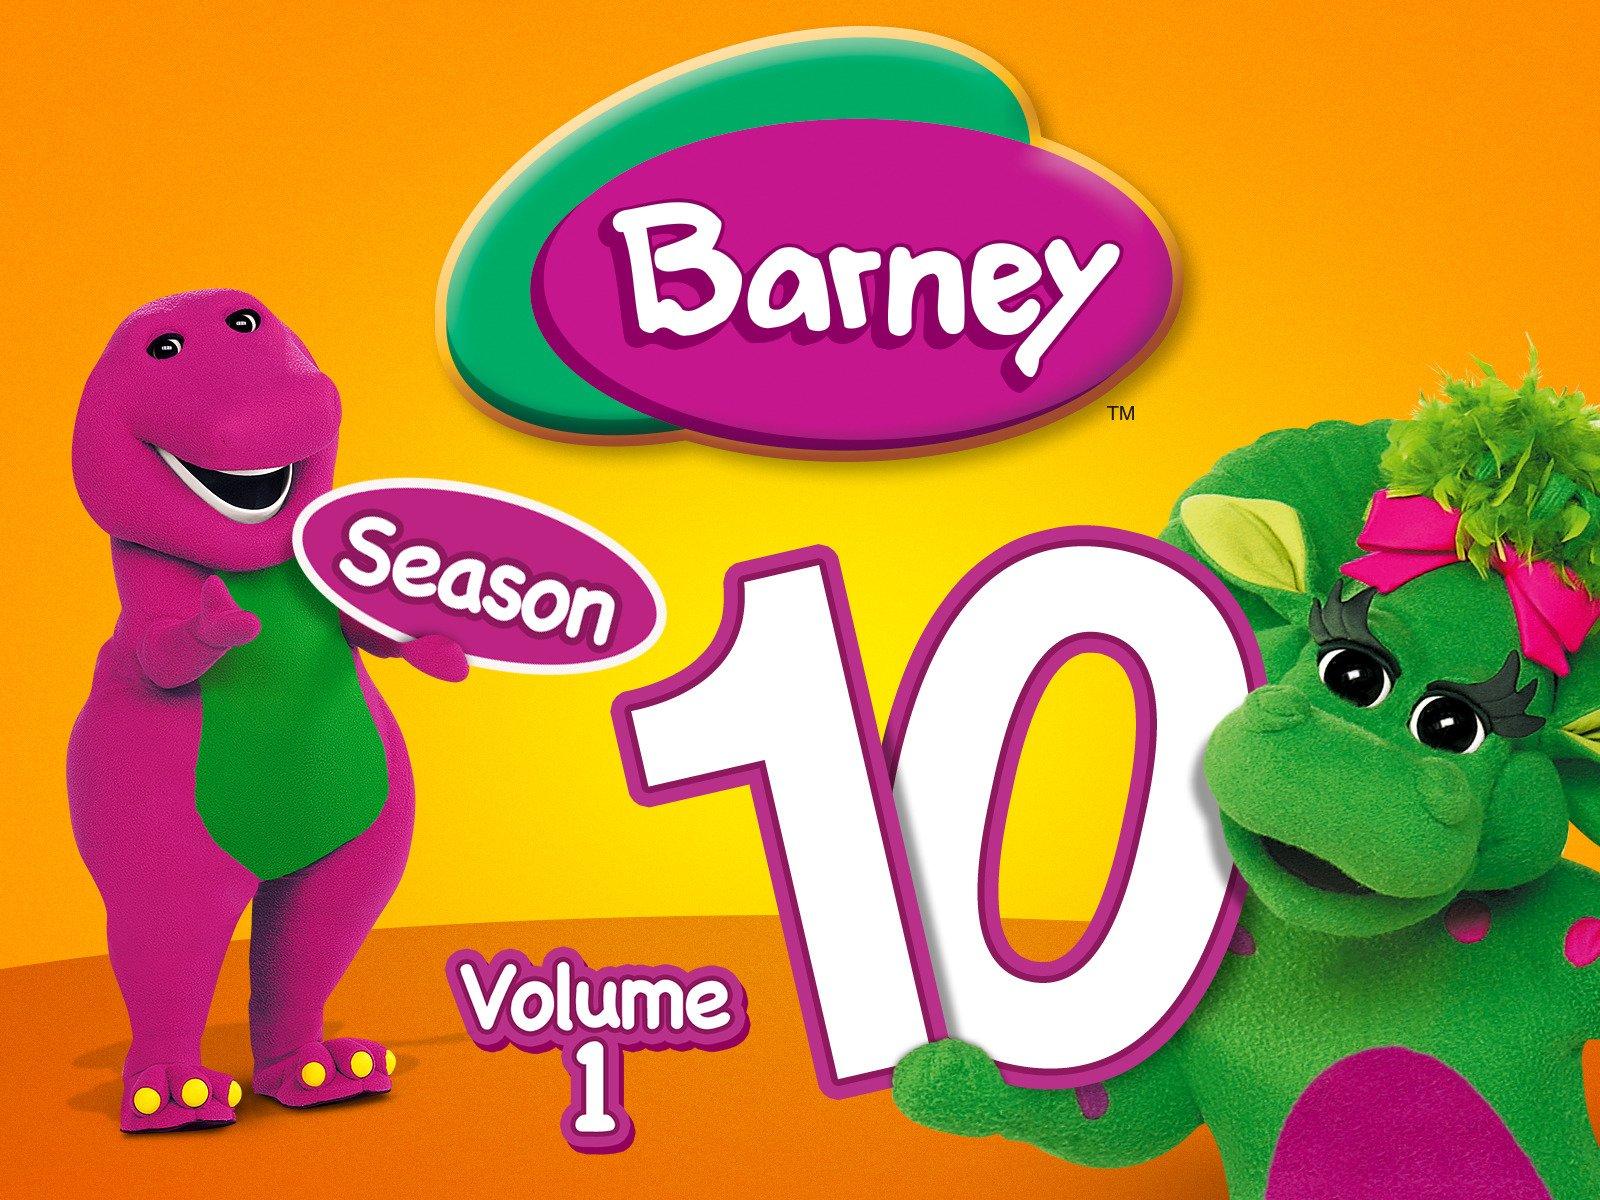 Amazon com: Watch Barney Season 10 Volume 1 | Prime Video